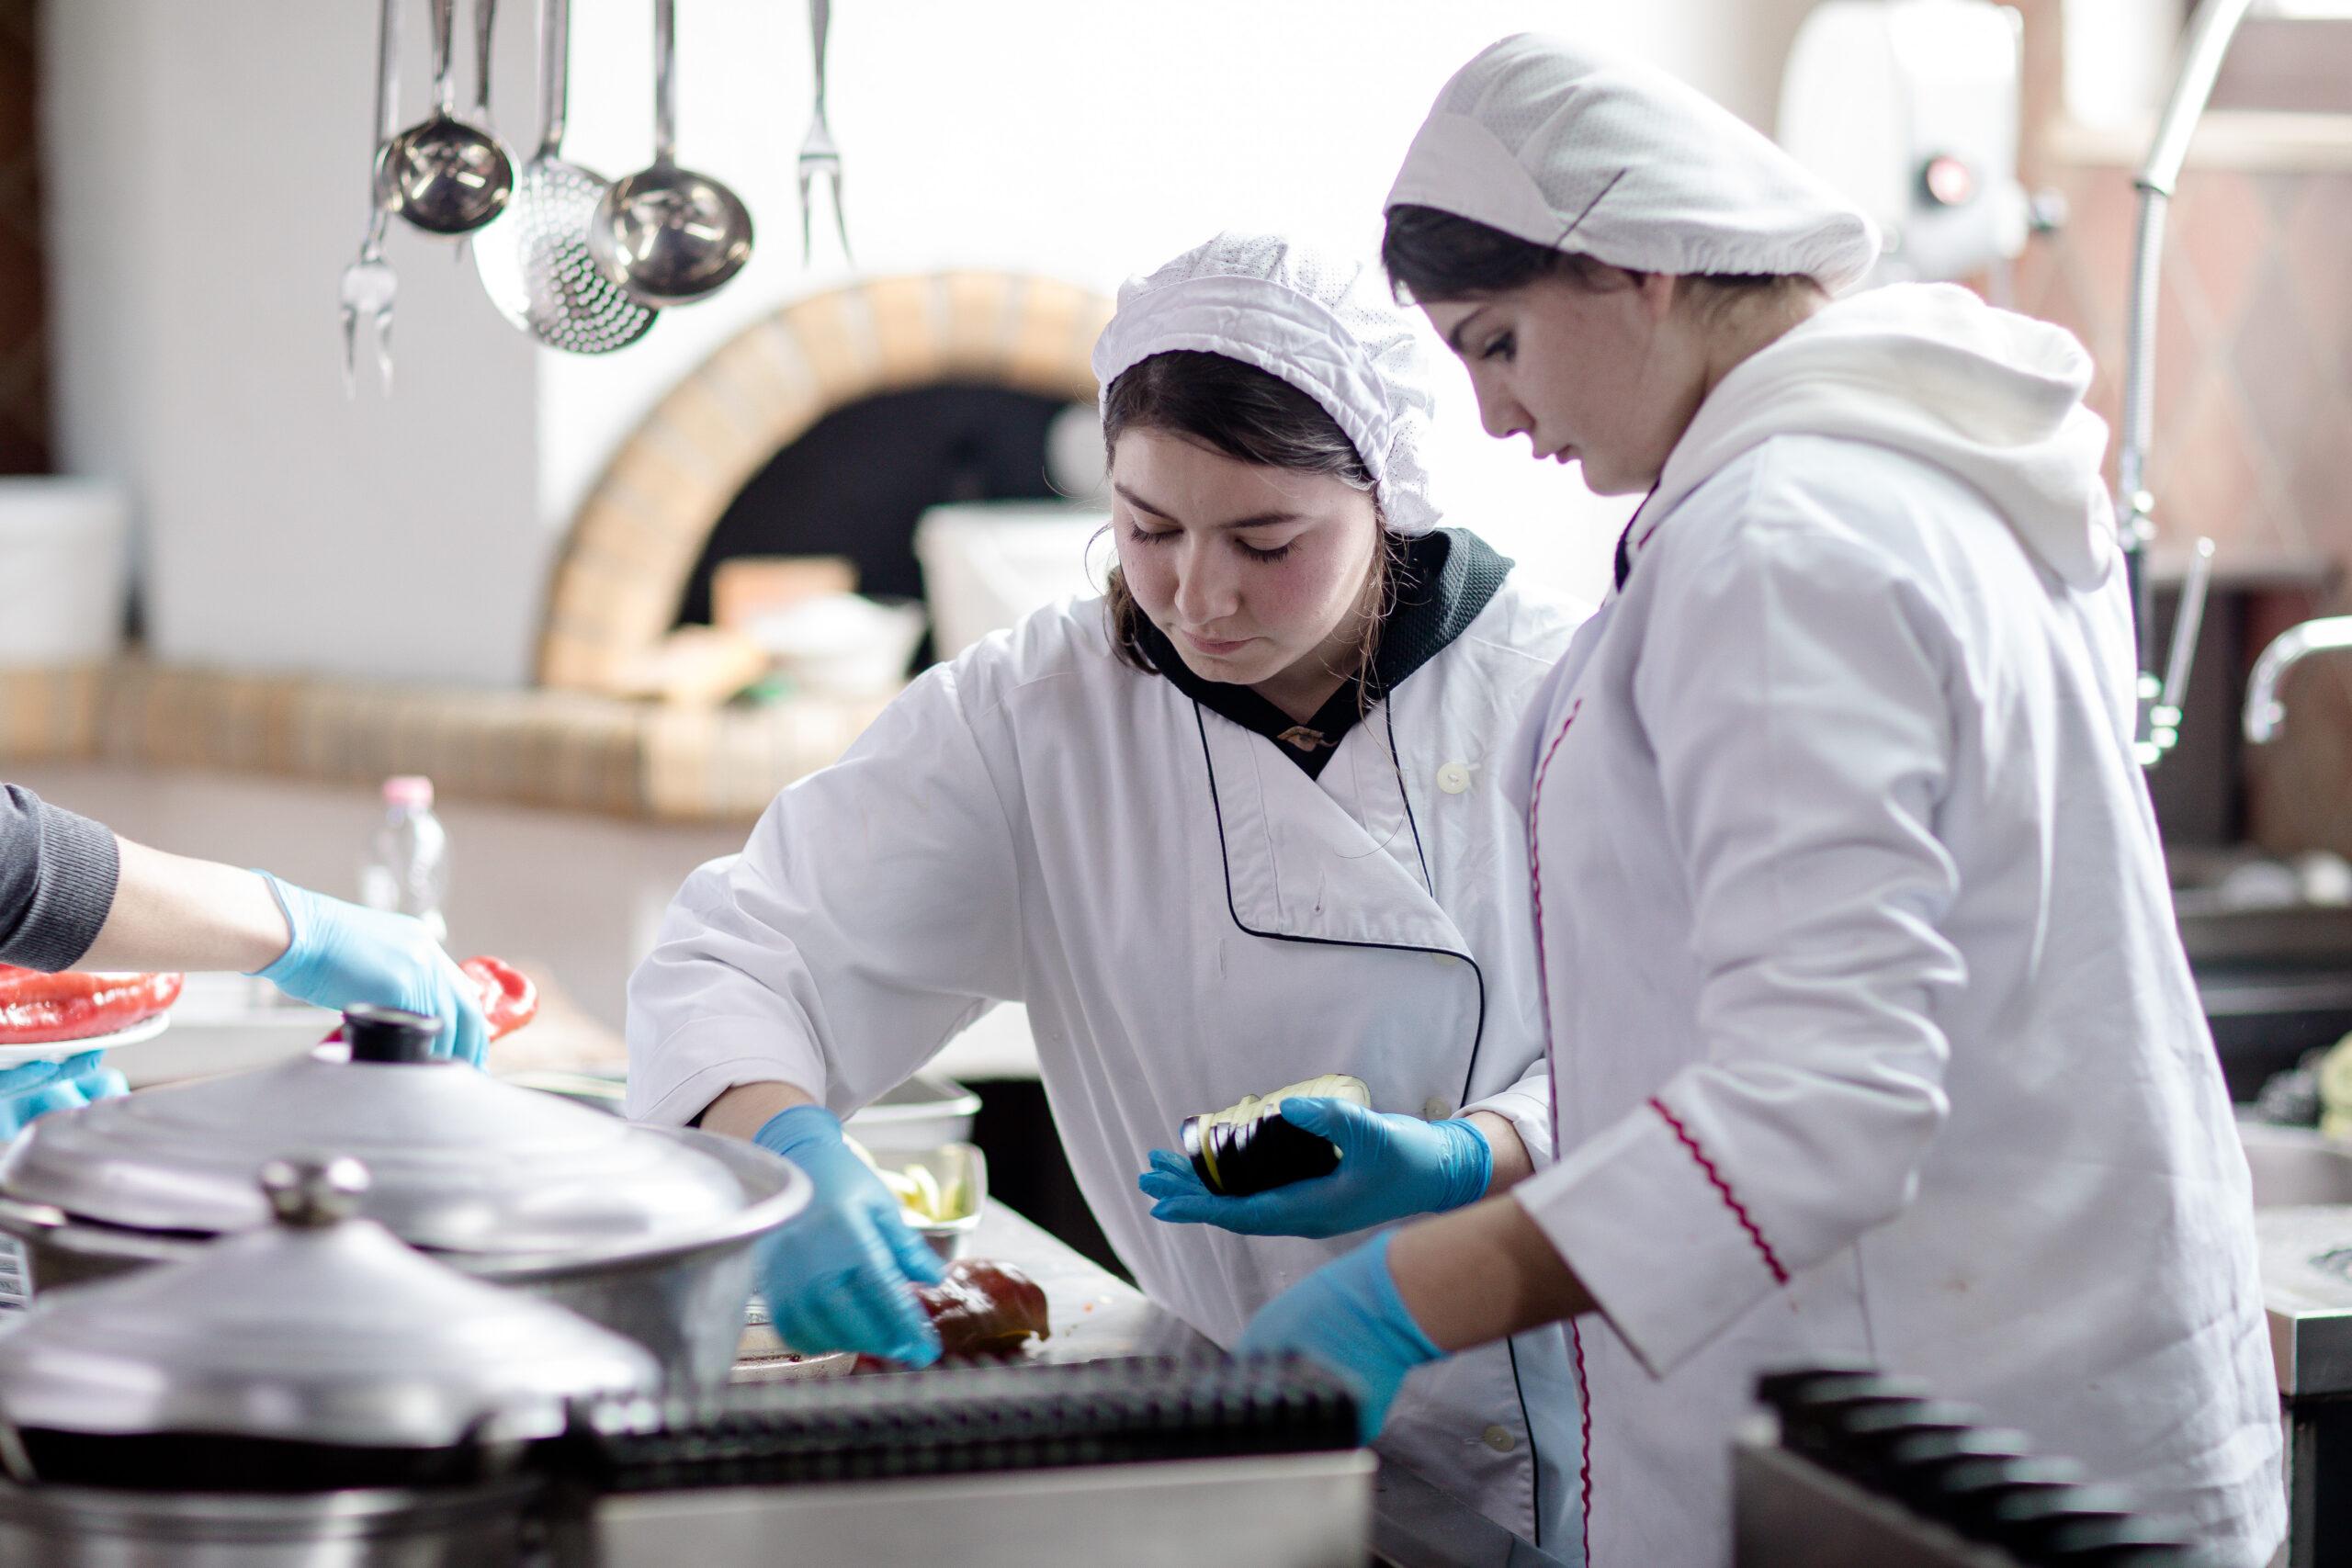 Initiatives Towards Labor Market Insertion